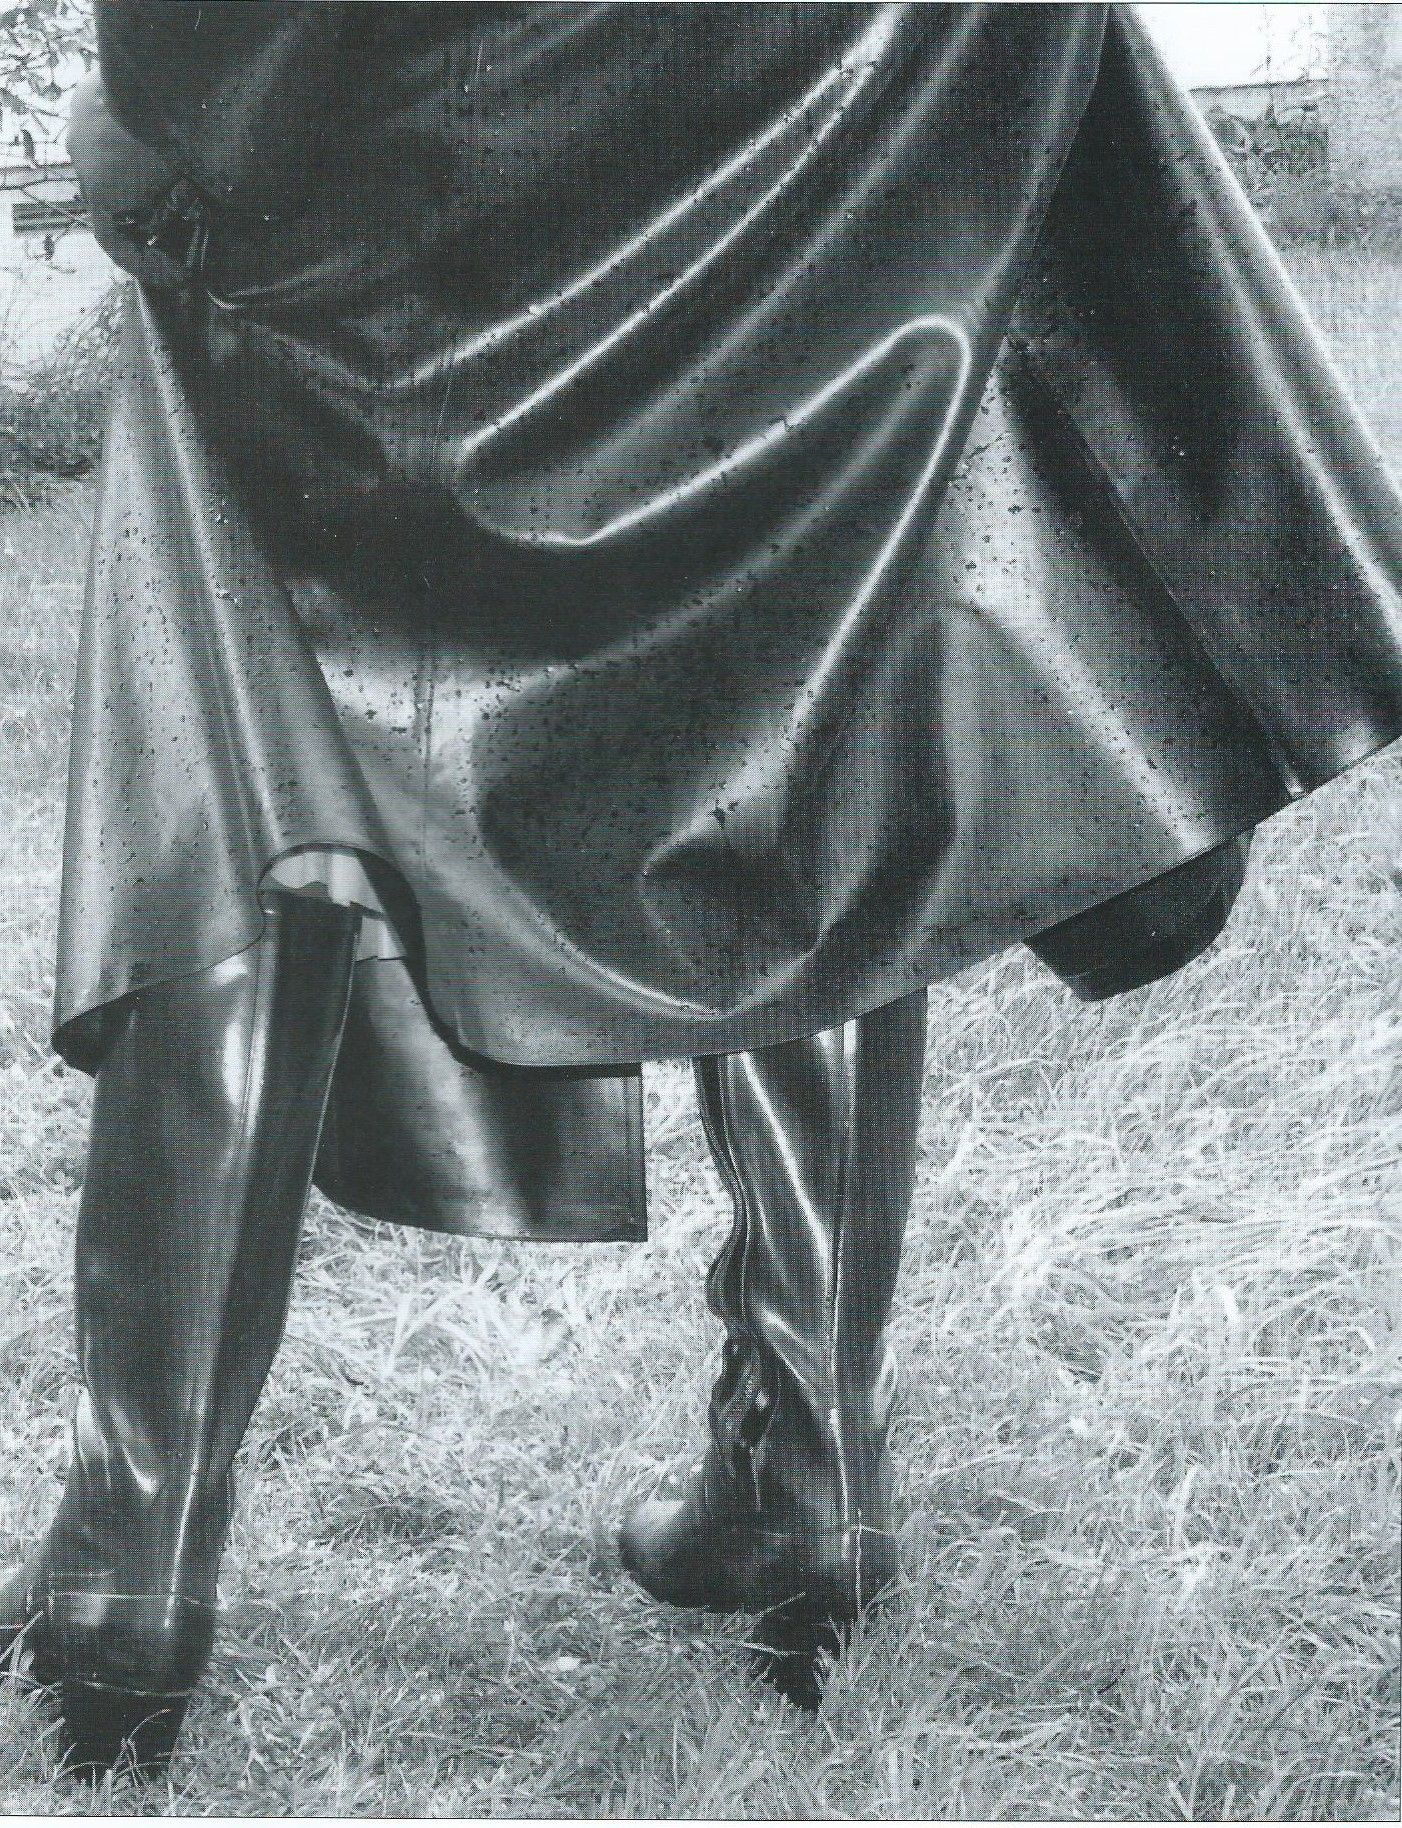 Pin by John Mackintosh on Mackintosh Miscellany | Rainwear